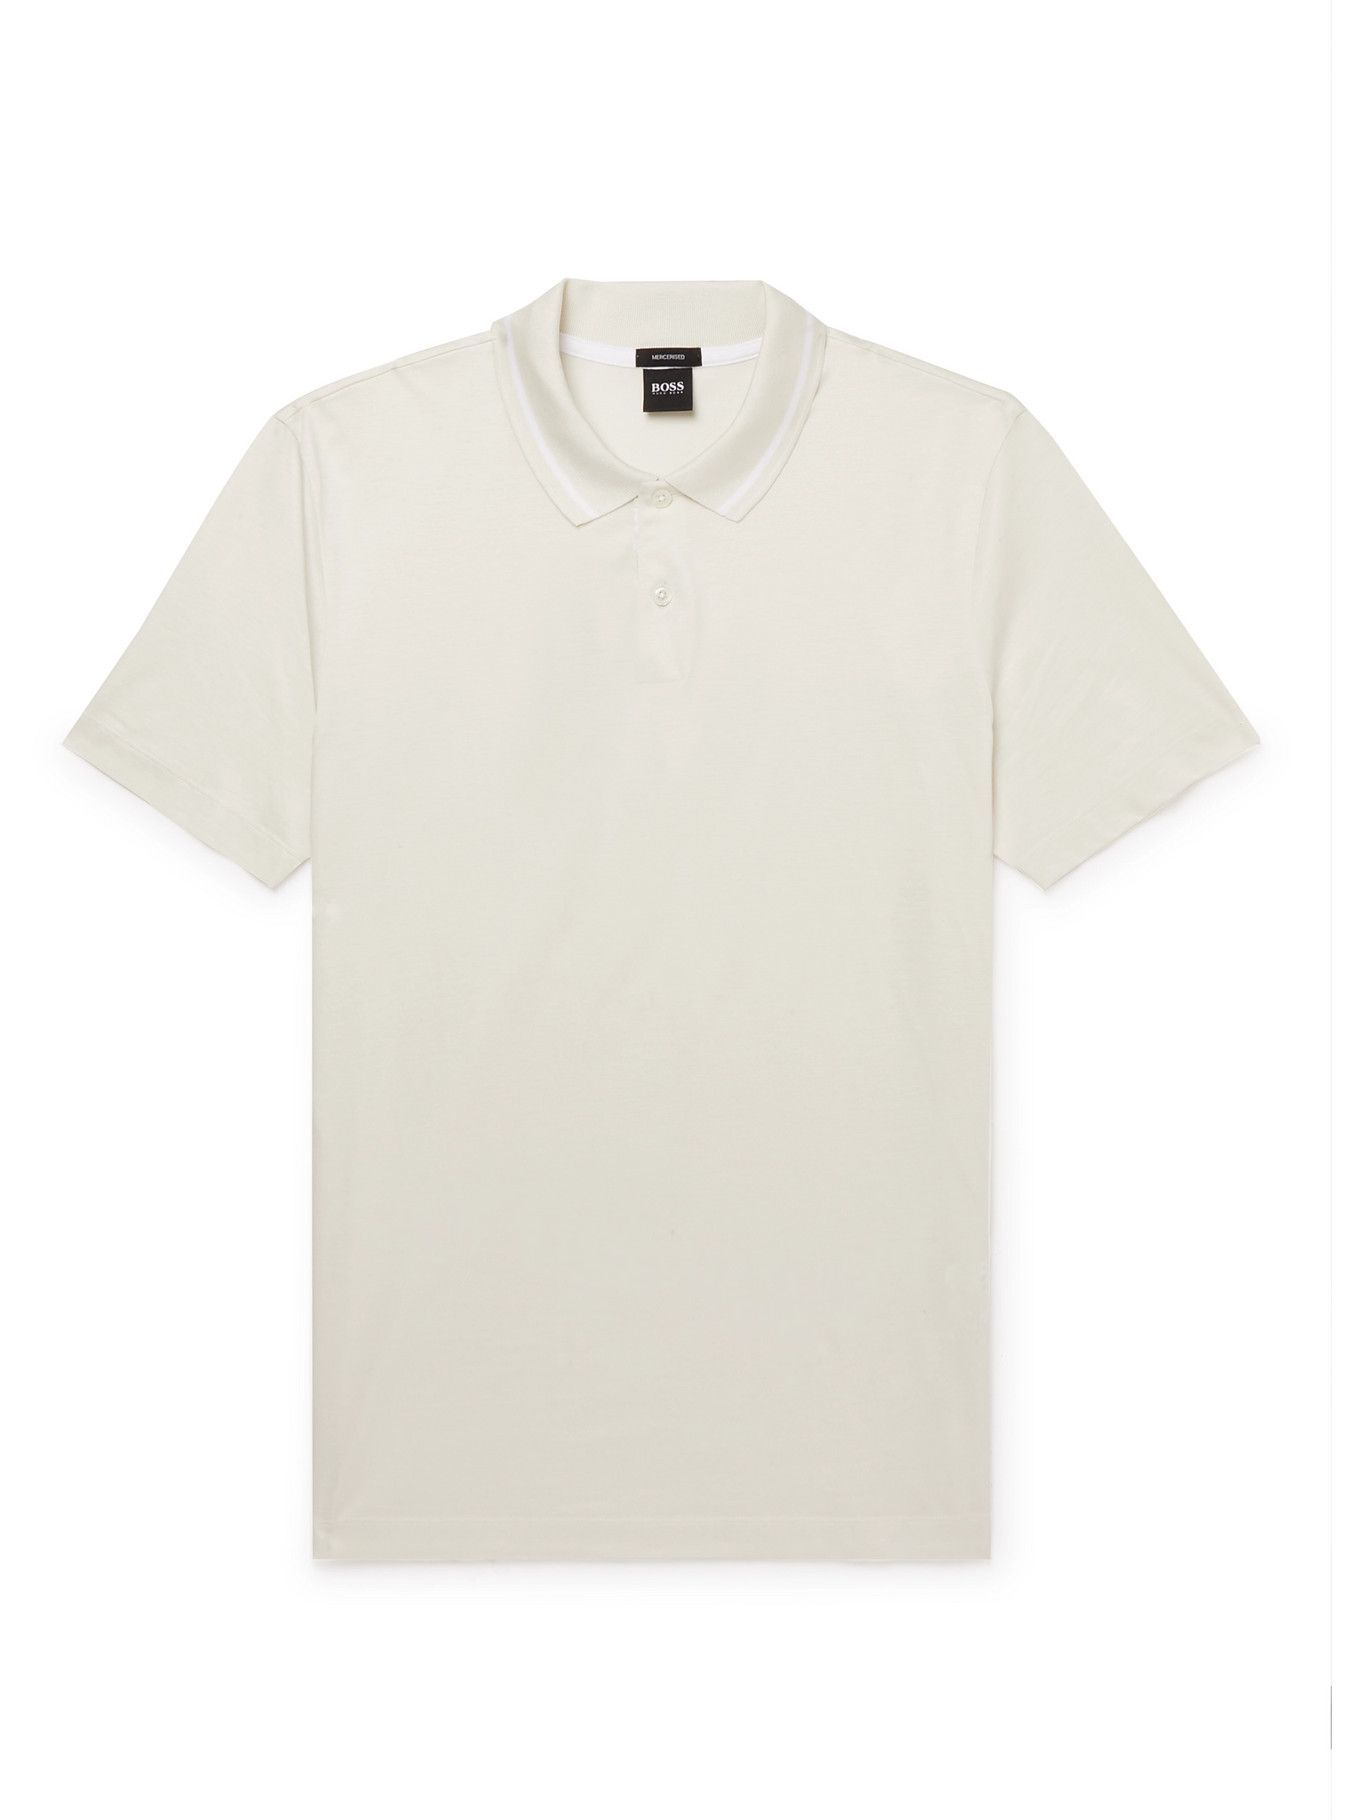 HUGO BOSS - Mercerised Cotton Polo Shirt - Neutrals